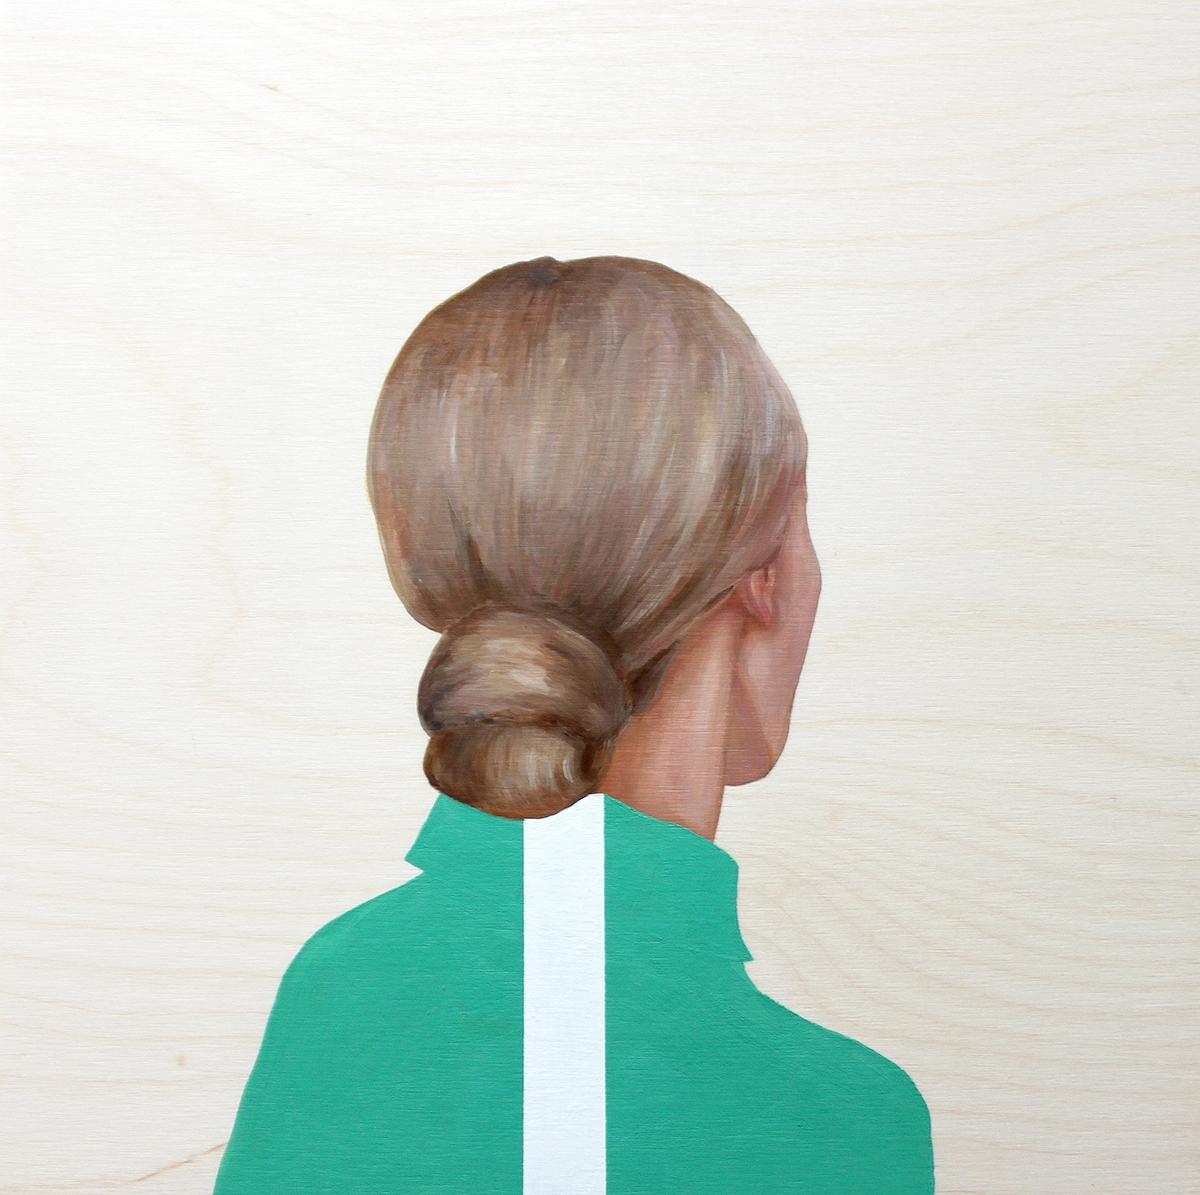 Girl in Green Shirt with White Stripe  by Marina  Nazarova